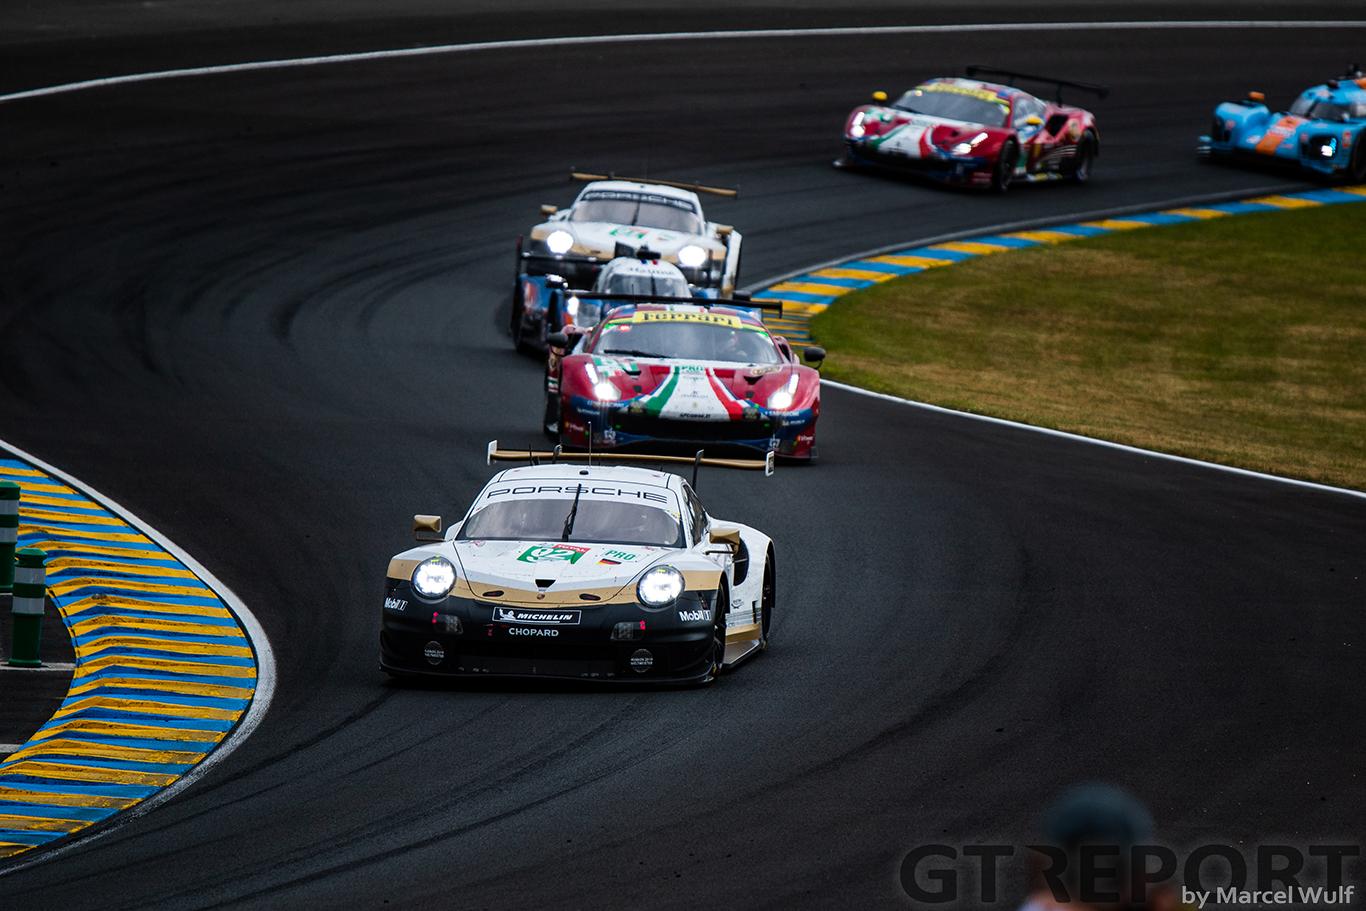 Porsche 24 hours Documentary